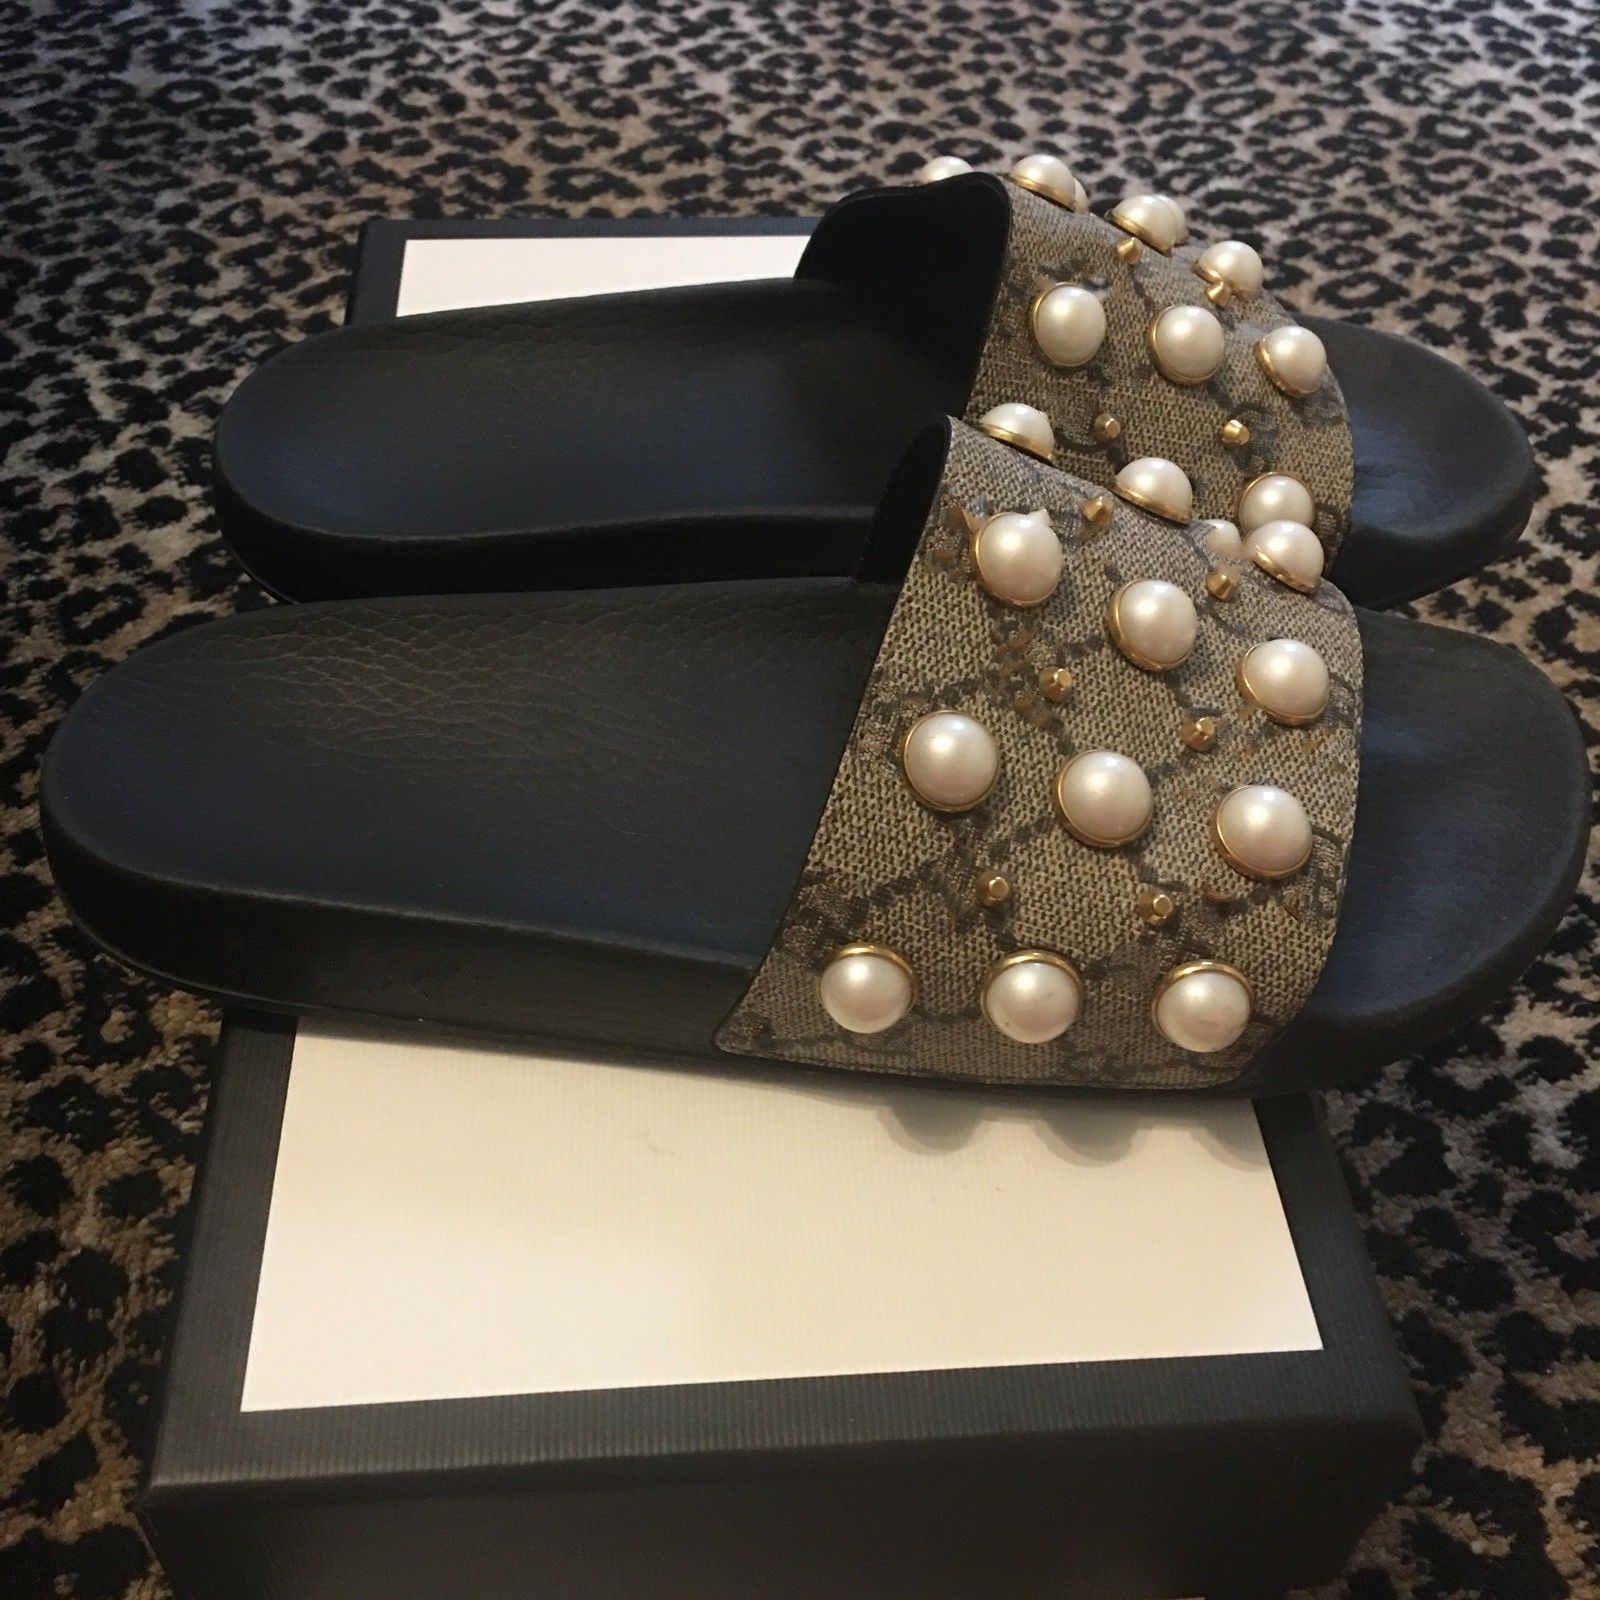 ed0e2609f480 With Box 2019 New Hot Women Pearl Rubber Pearl Slide Sandal Slippers Flip  Flops Brand New NIB Women S Pursuit Pool Slide Sandals Buy Shoes Online  Wedge ...